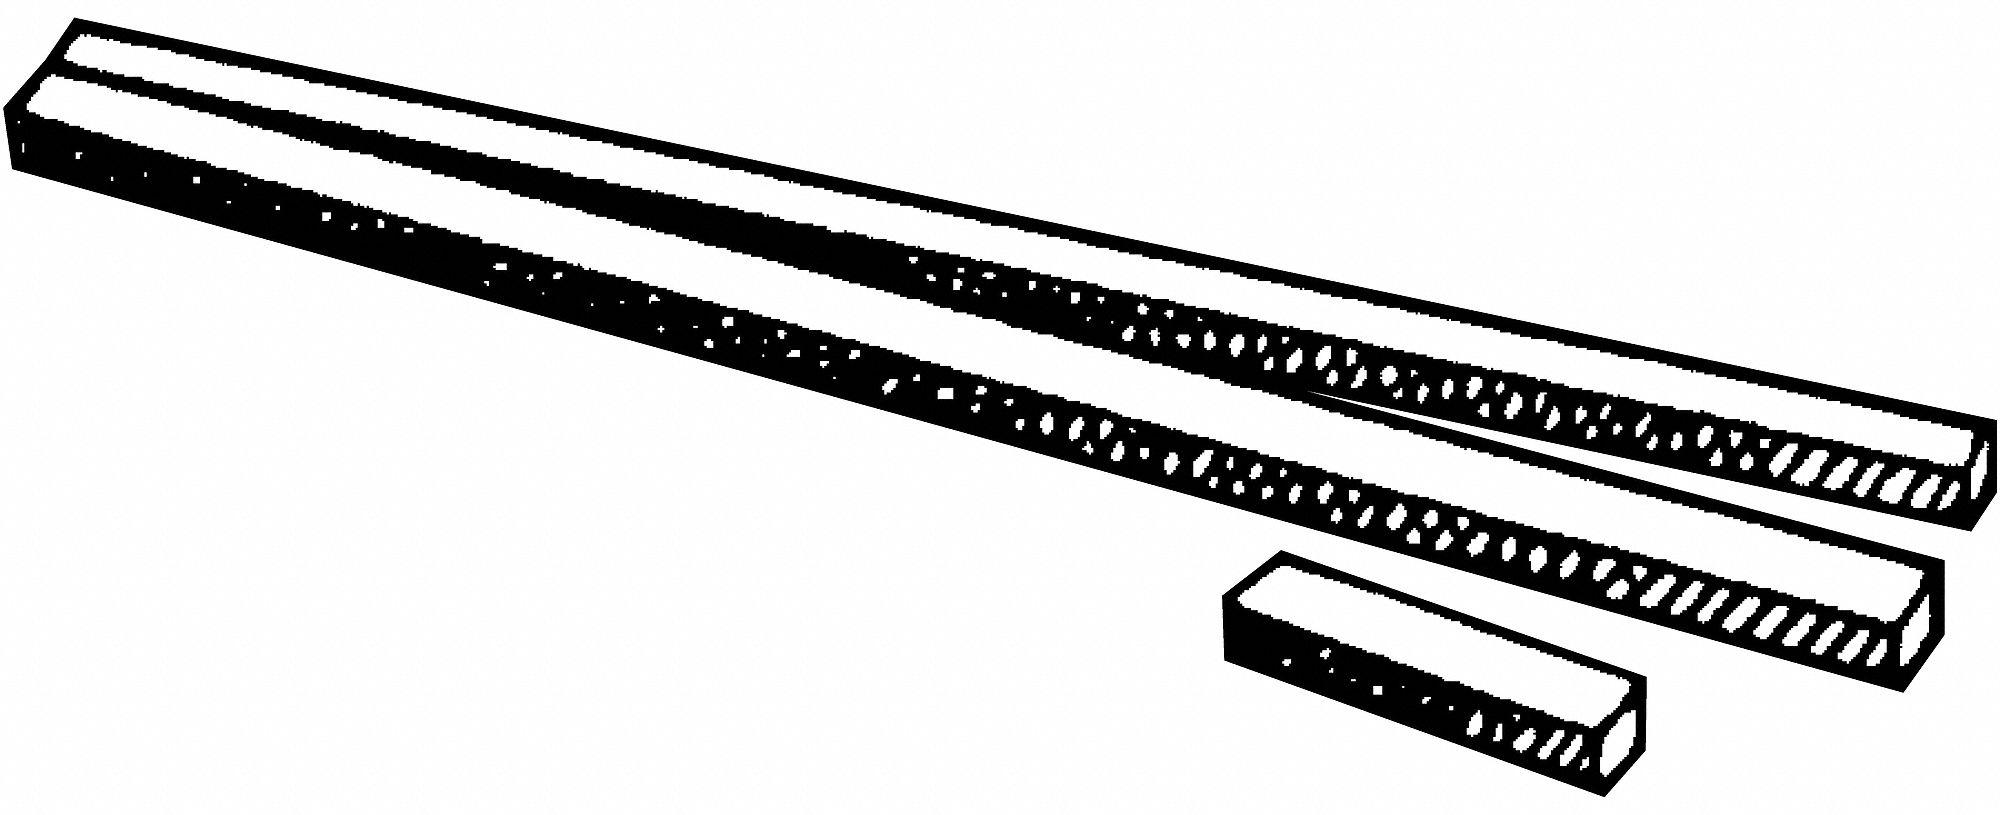 grainger approved machine key kit  25 pc - 5we27